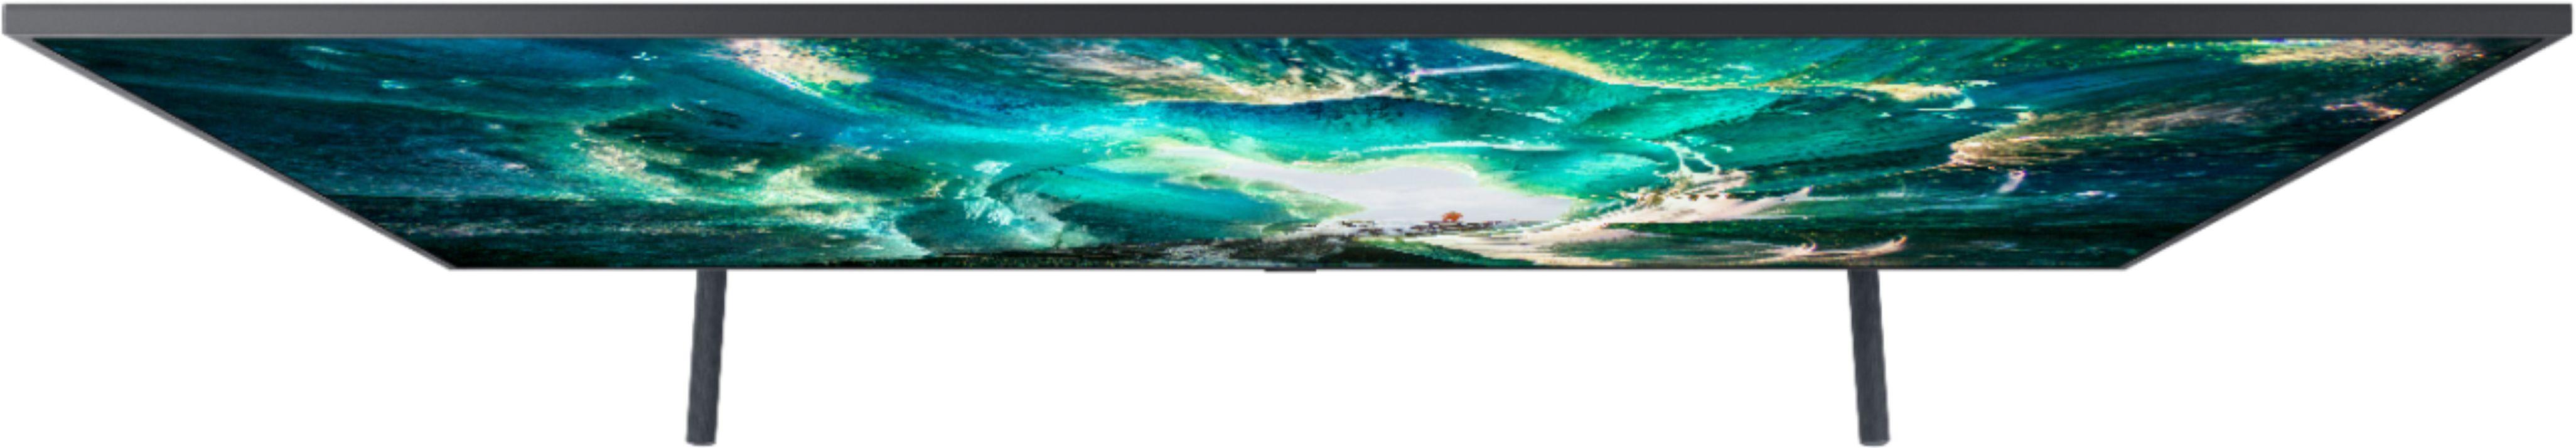 Image 5 for Samsung UN75RU8000FXZA